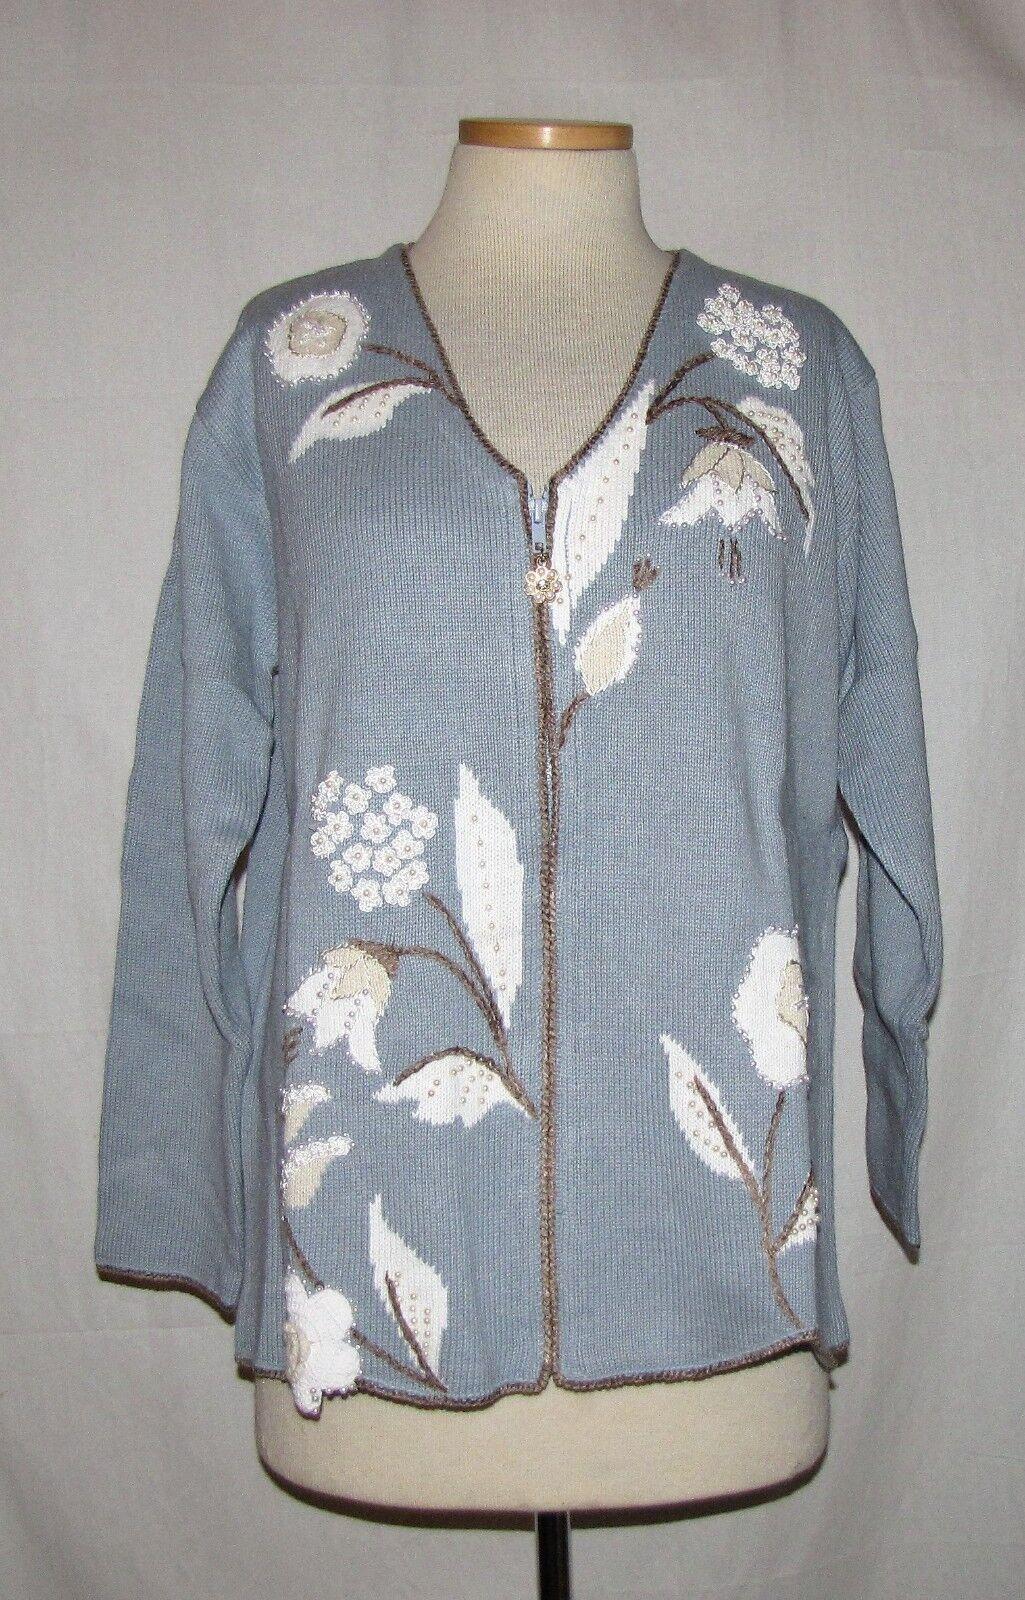 Storybook Knits  Luminous Garden  bluee w Jeweled Jacquard Flowers Sweater L NWT